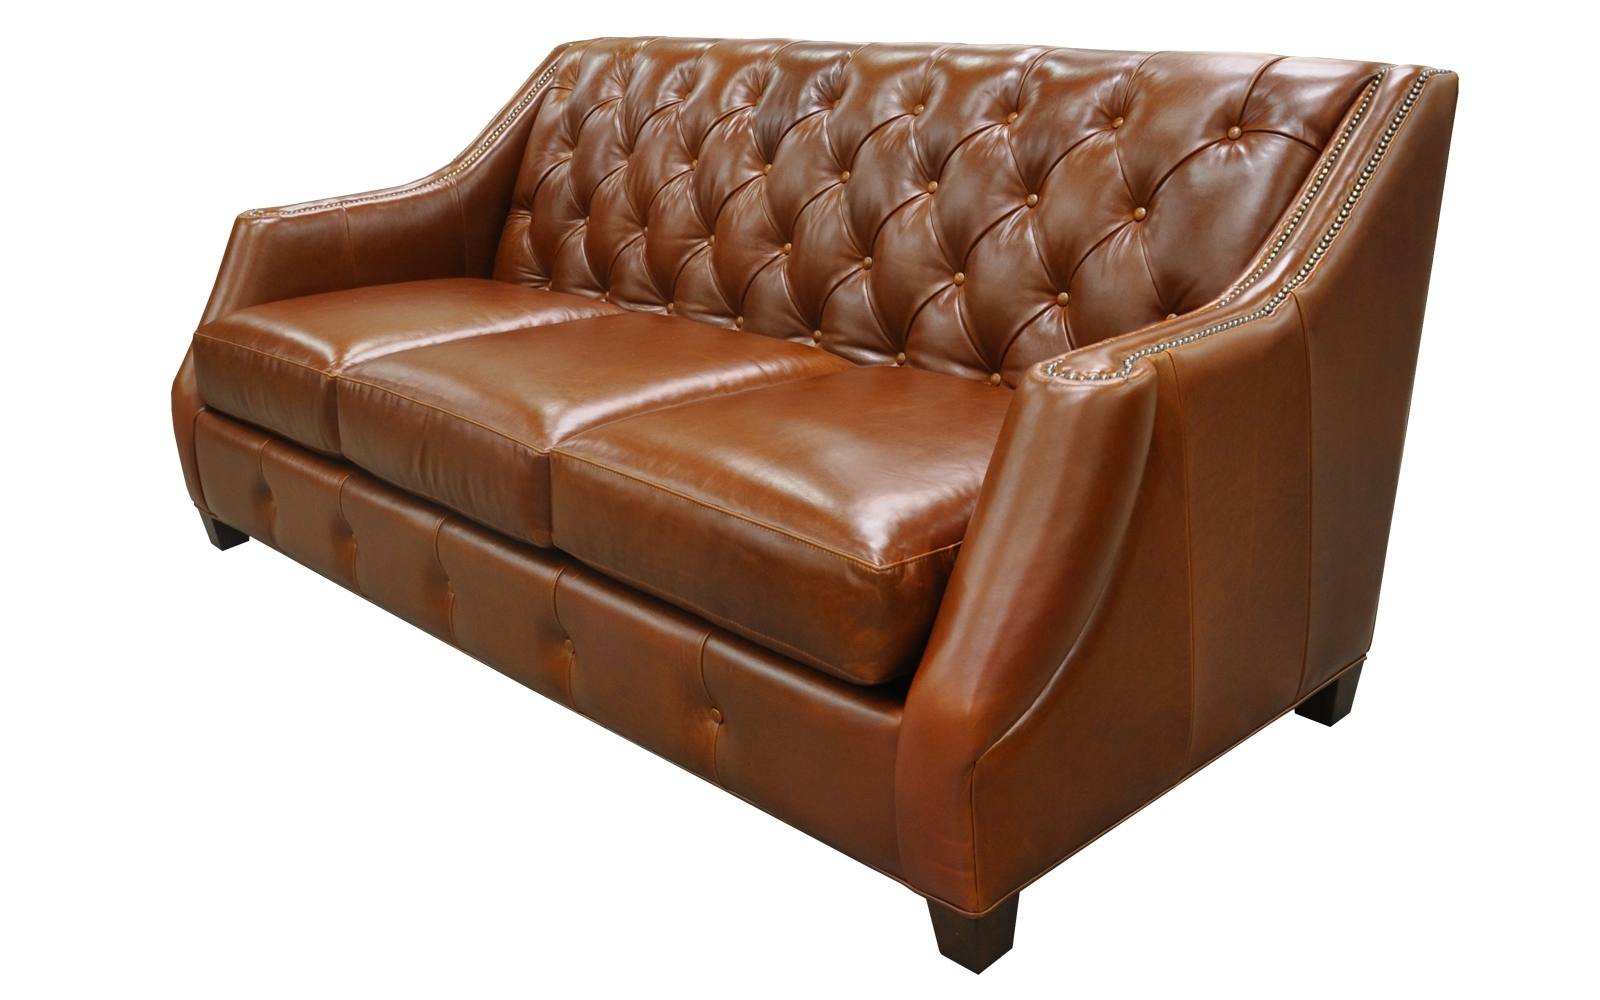 Fashionable Scarborough Sectional Sofas Inside Scarborough Sofa – Omnia Leather (View 5 of 15)